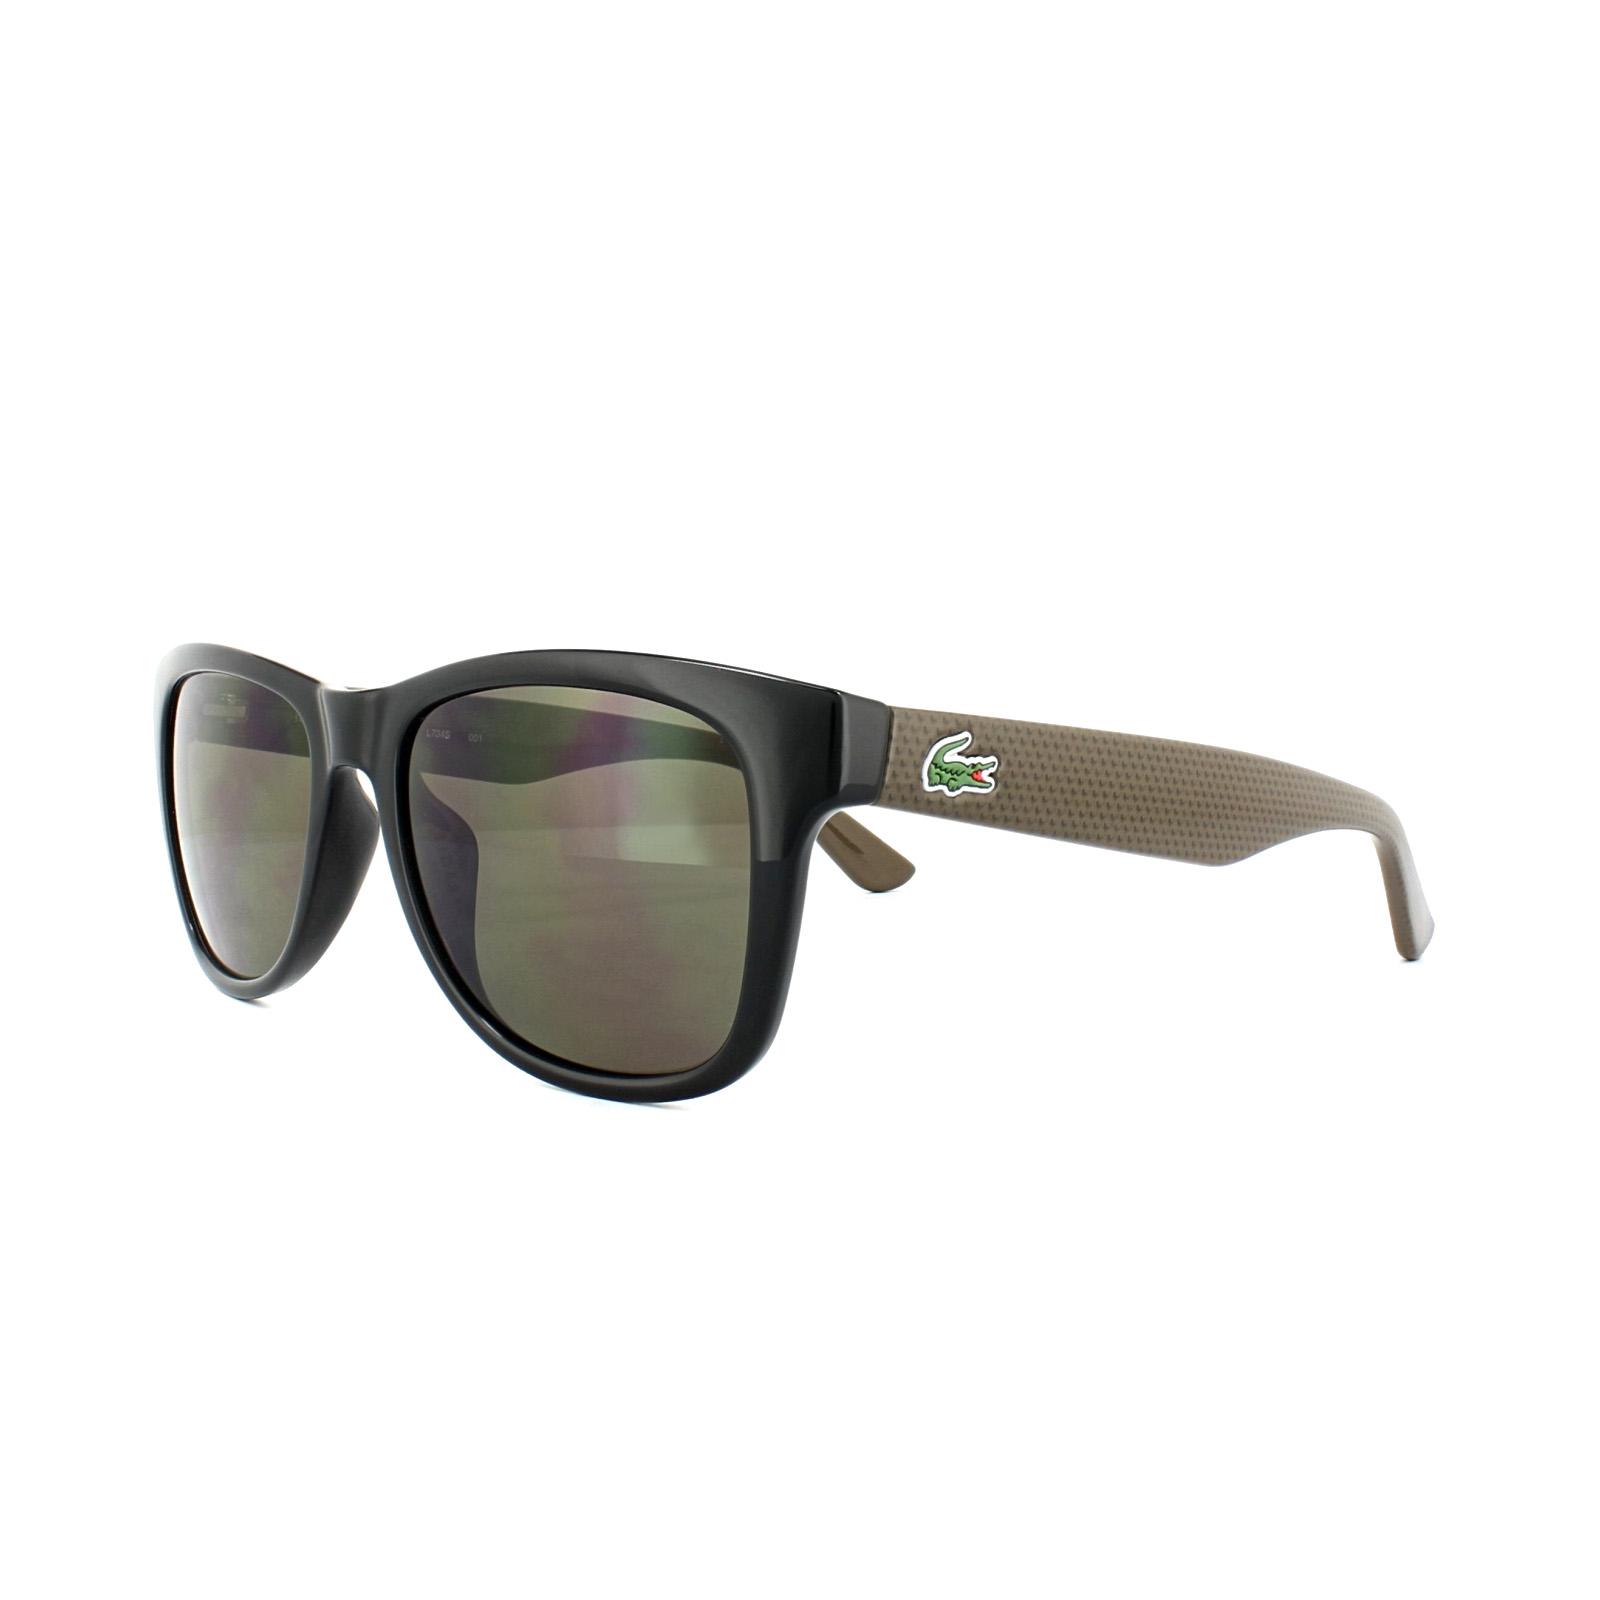 94158b02f414 Lacoste Sunglasses L734S 001 Black Brown Grey Gradient 883121973480 ...